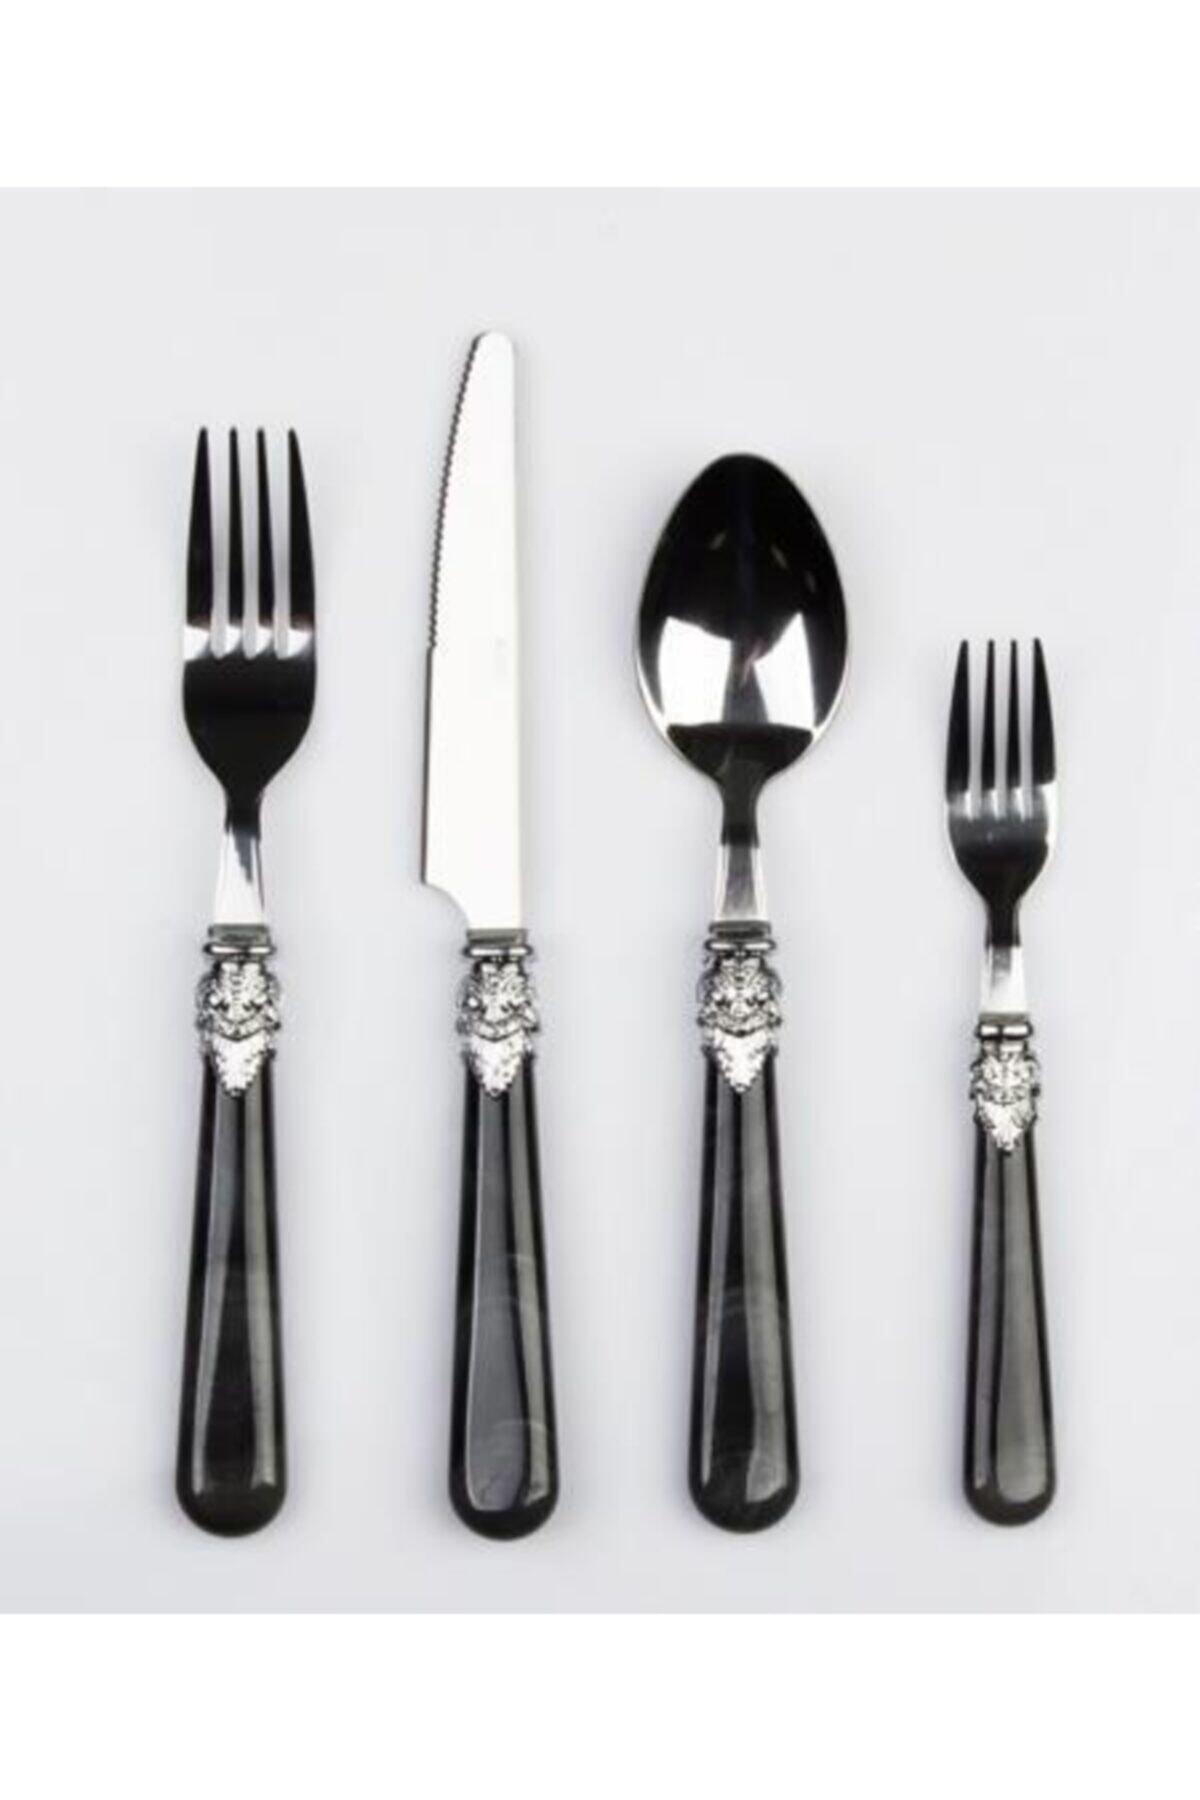 ACAR Maria 24 Parça Çelik Çatal Kaşık Bıçak Seti 500089-siyah 1